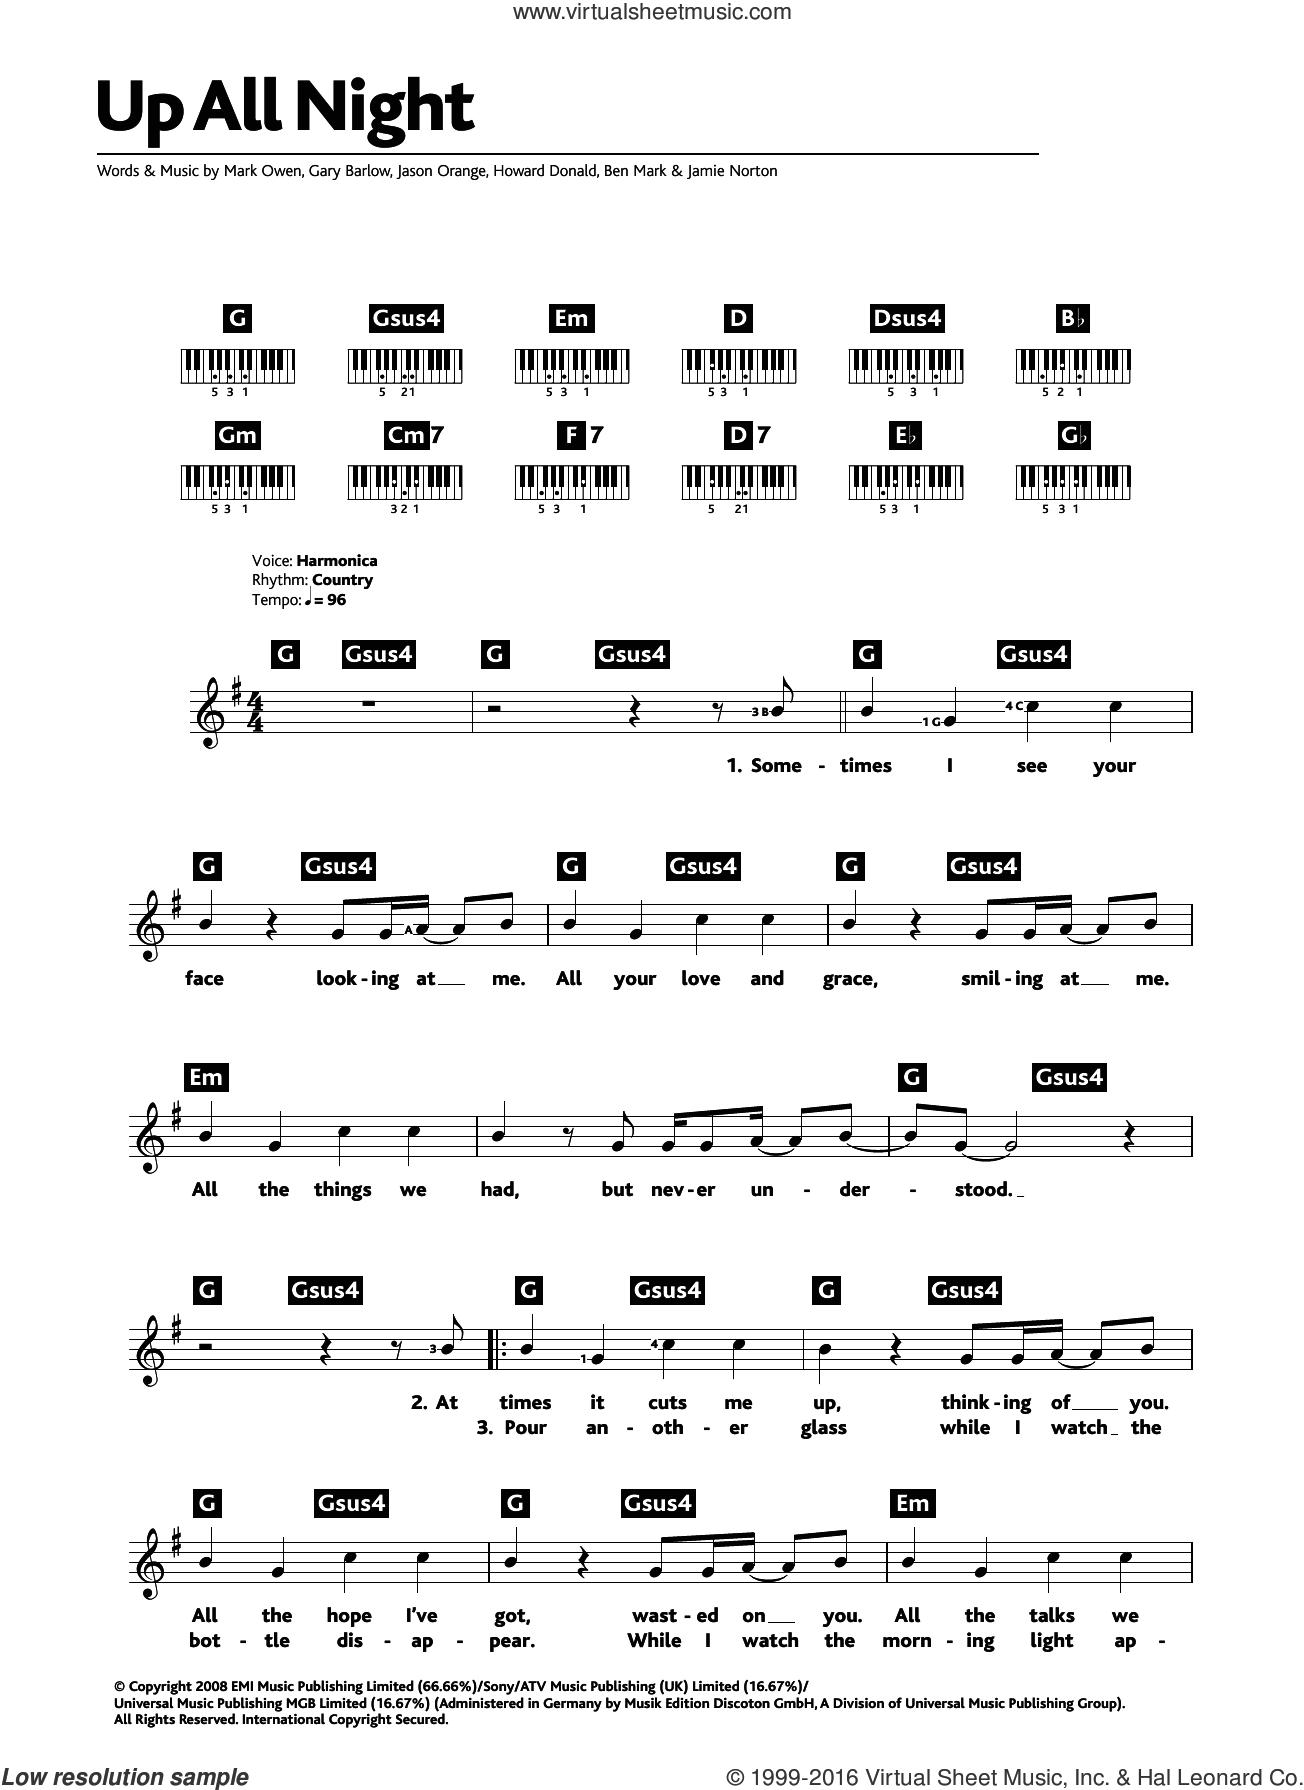 Up All Night sheet music for piano solo (chords, lyrics, melody) by Take That, Ben Mark, Gary Barlow, Howard Donald, Jamie Norton, Jason Orange and Mark Owen, intermediate piano (chords, lyrics, melody)